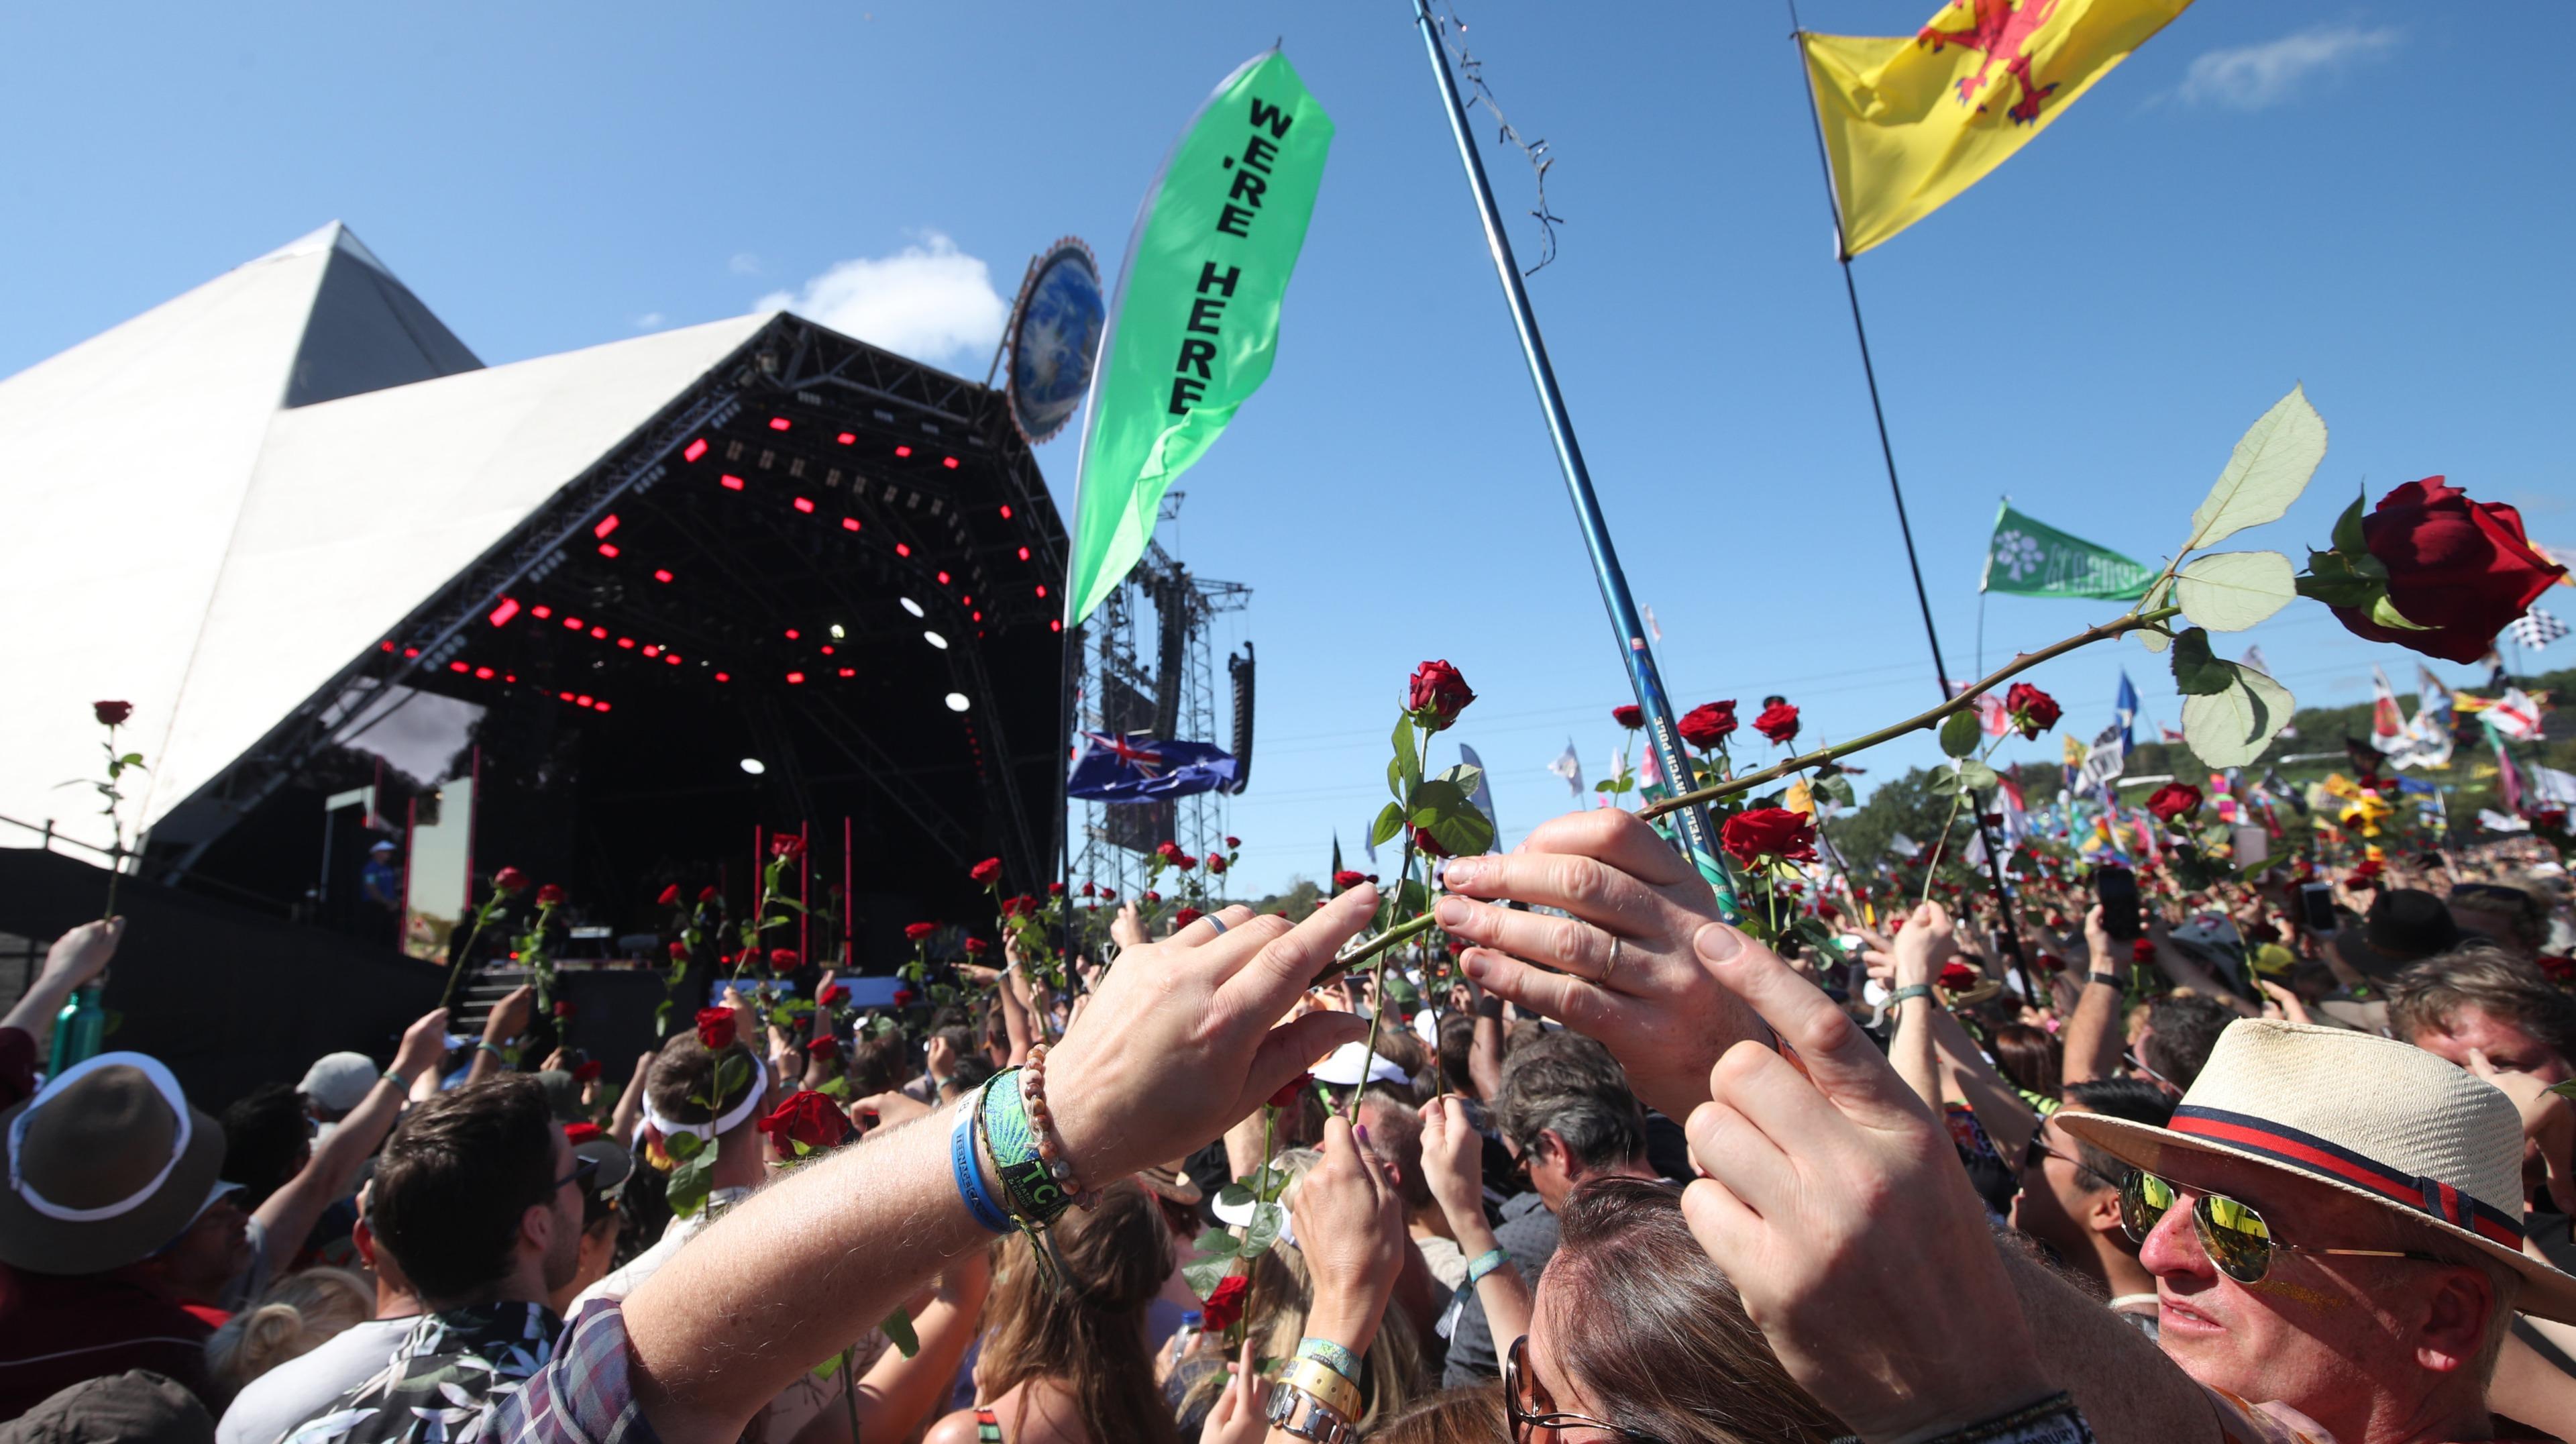 Glastonbury Festival 2021